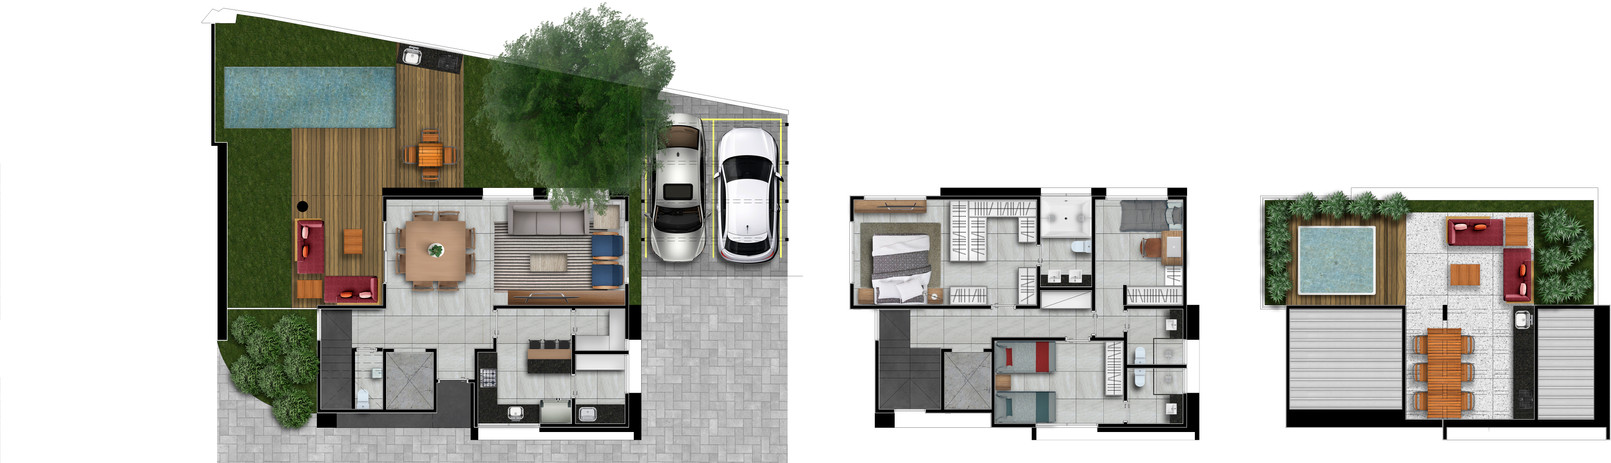 Casa 350m2